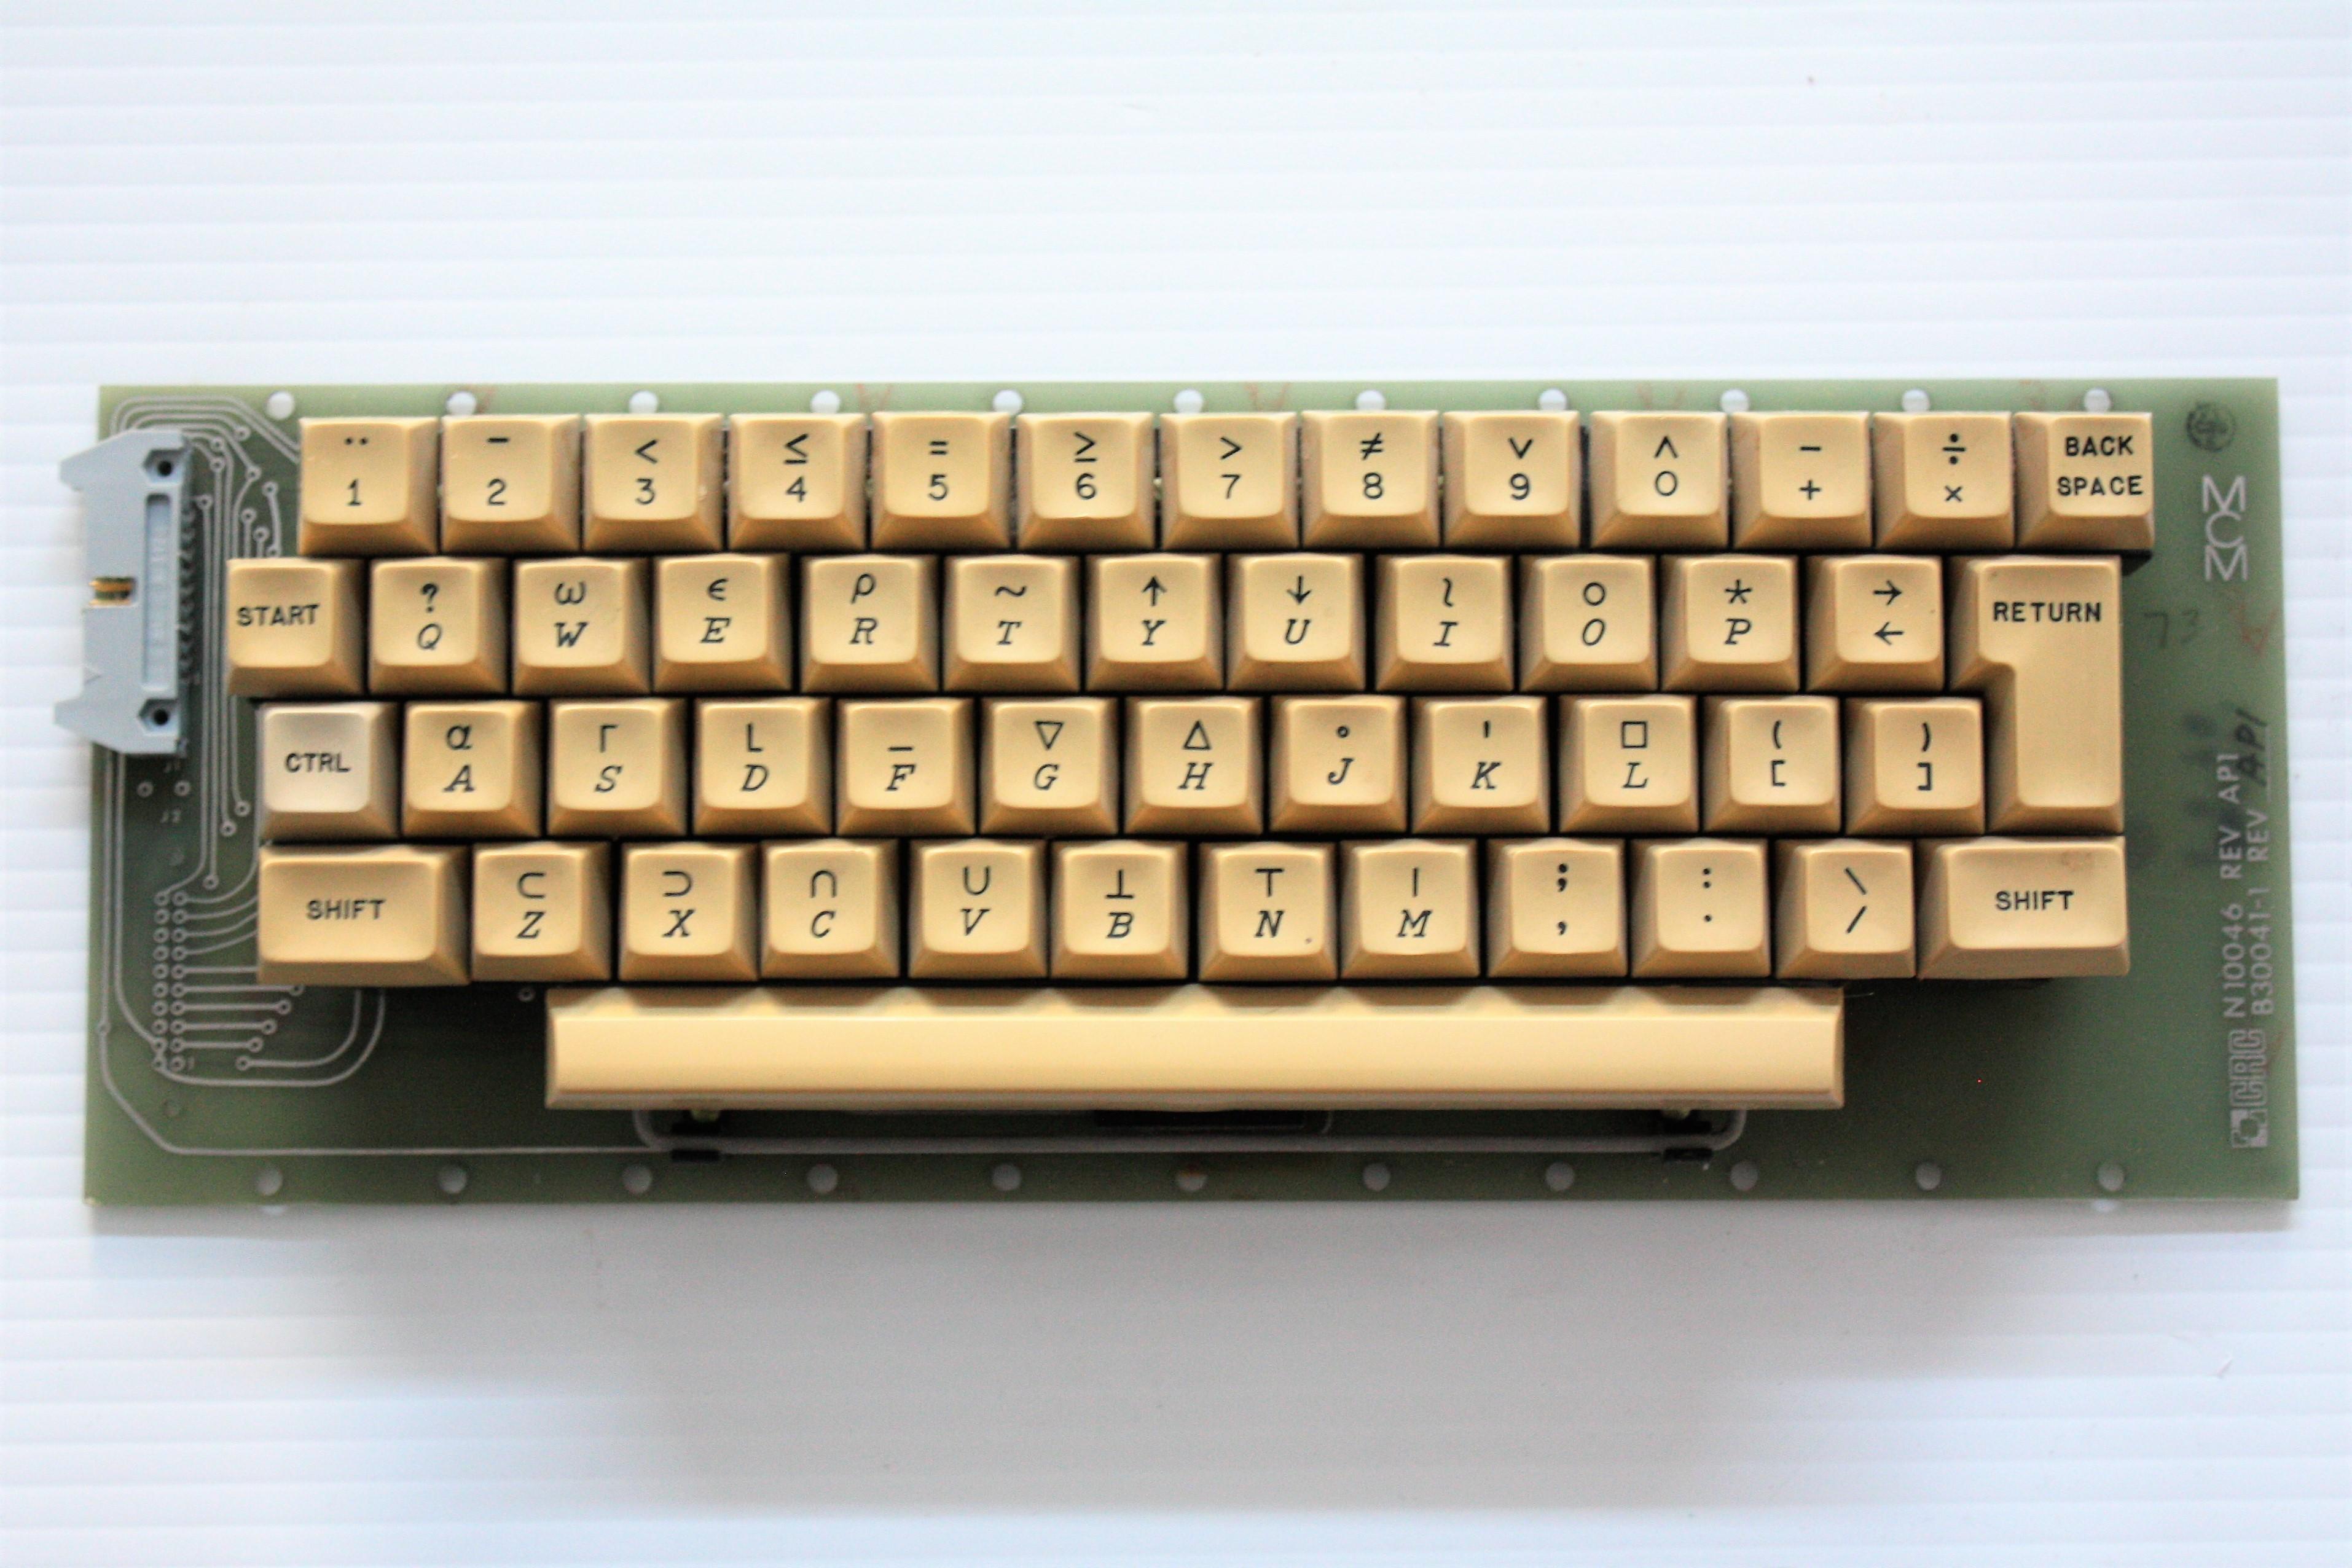 MCM70 - keyboard front.JPG